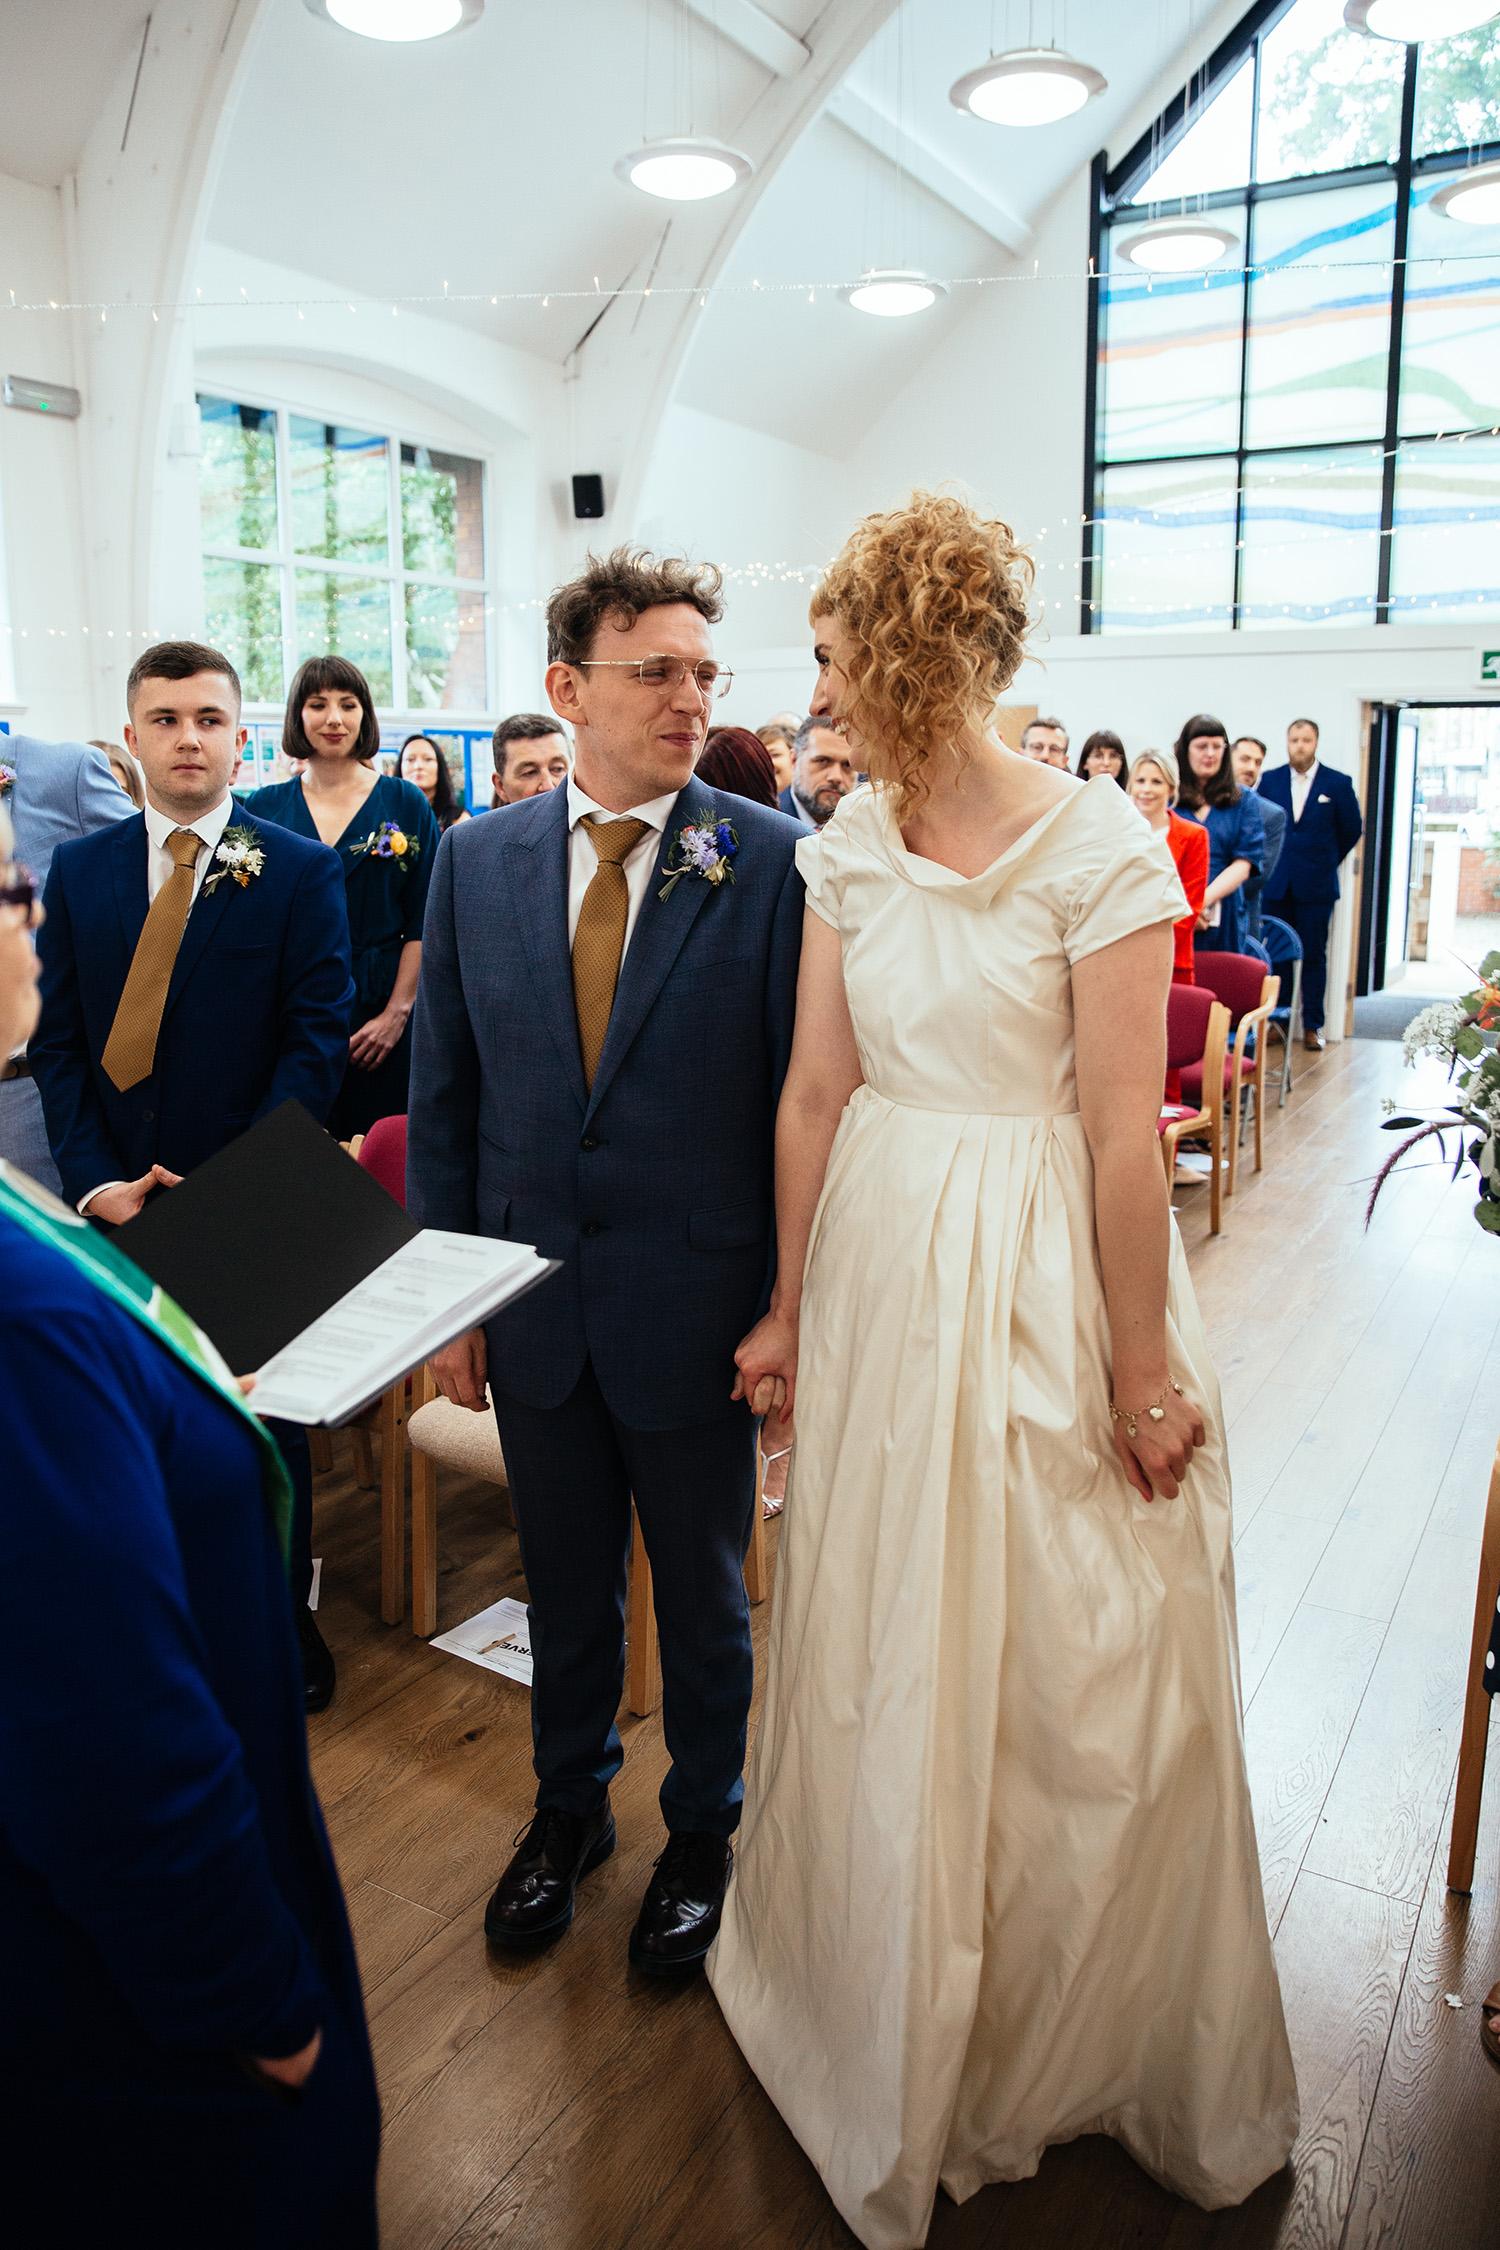 Manchester Wes Anderson Village Hall Wedding 048.jpg